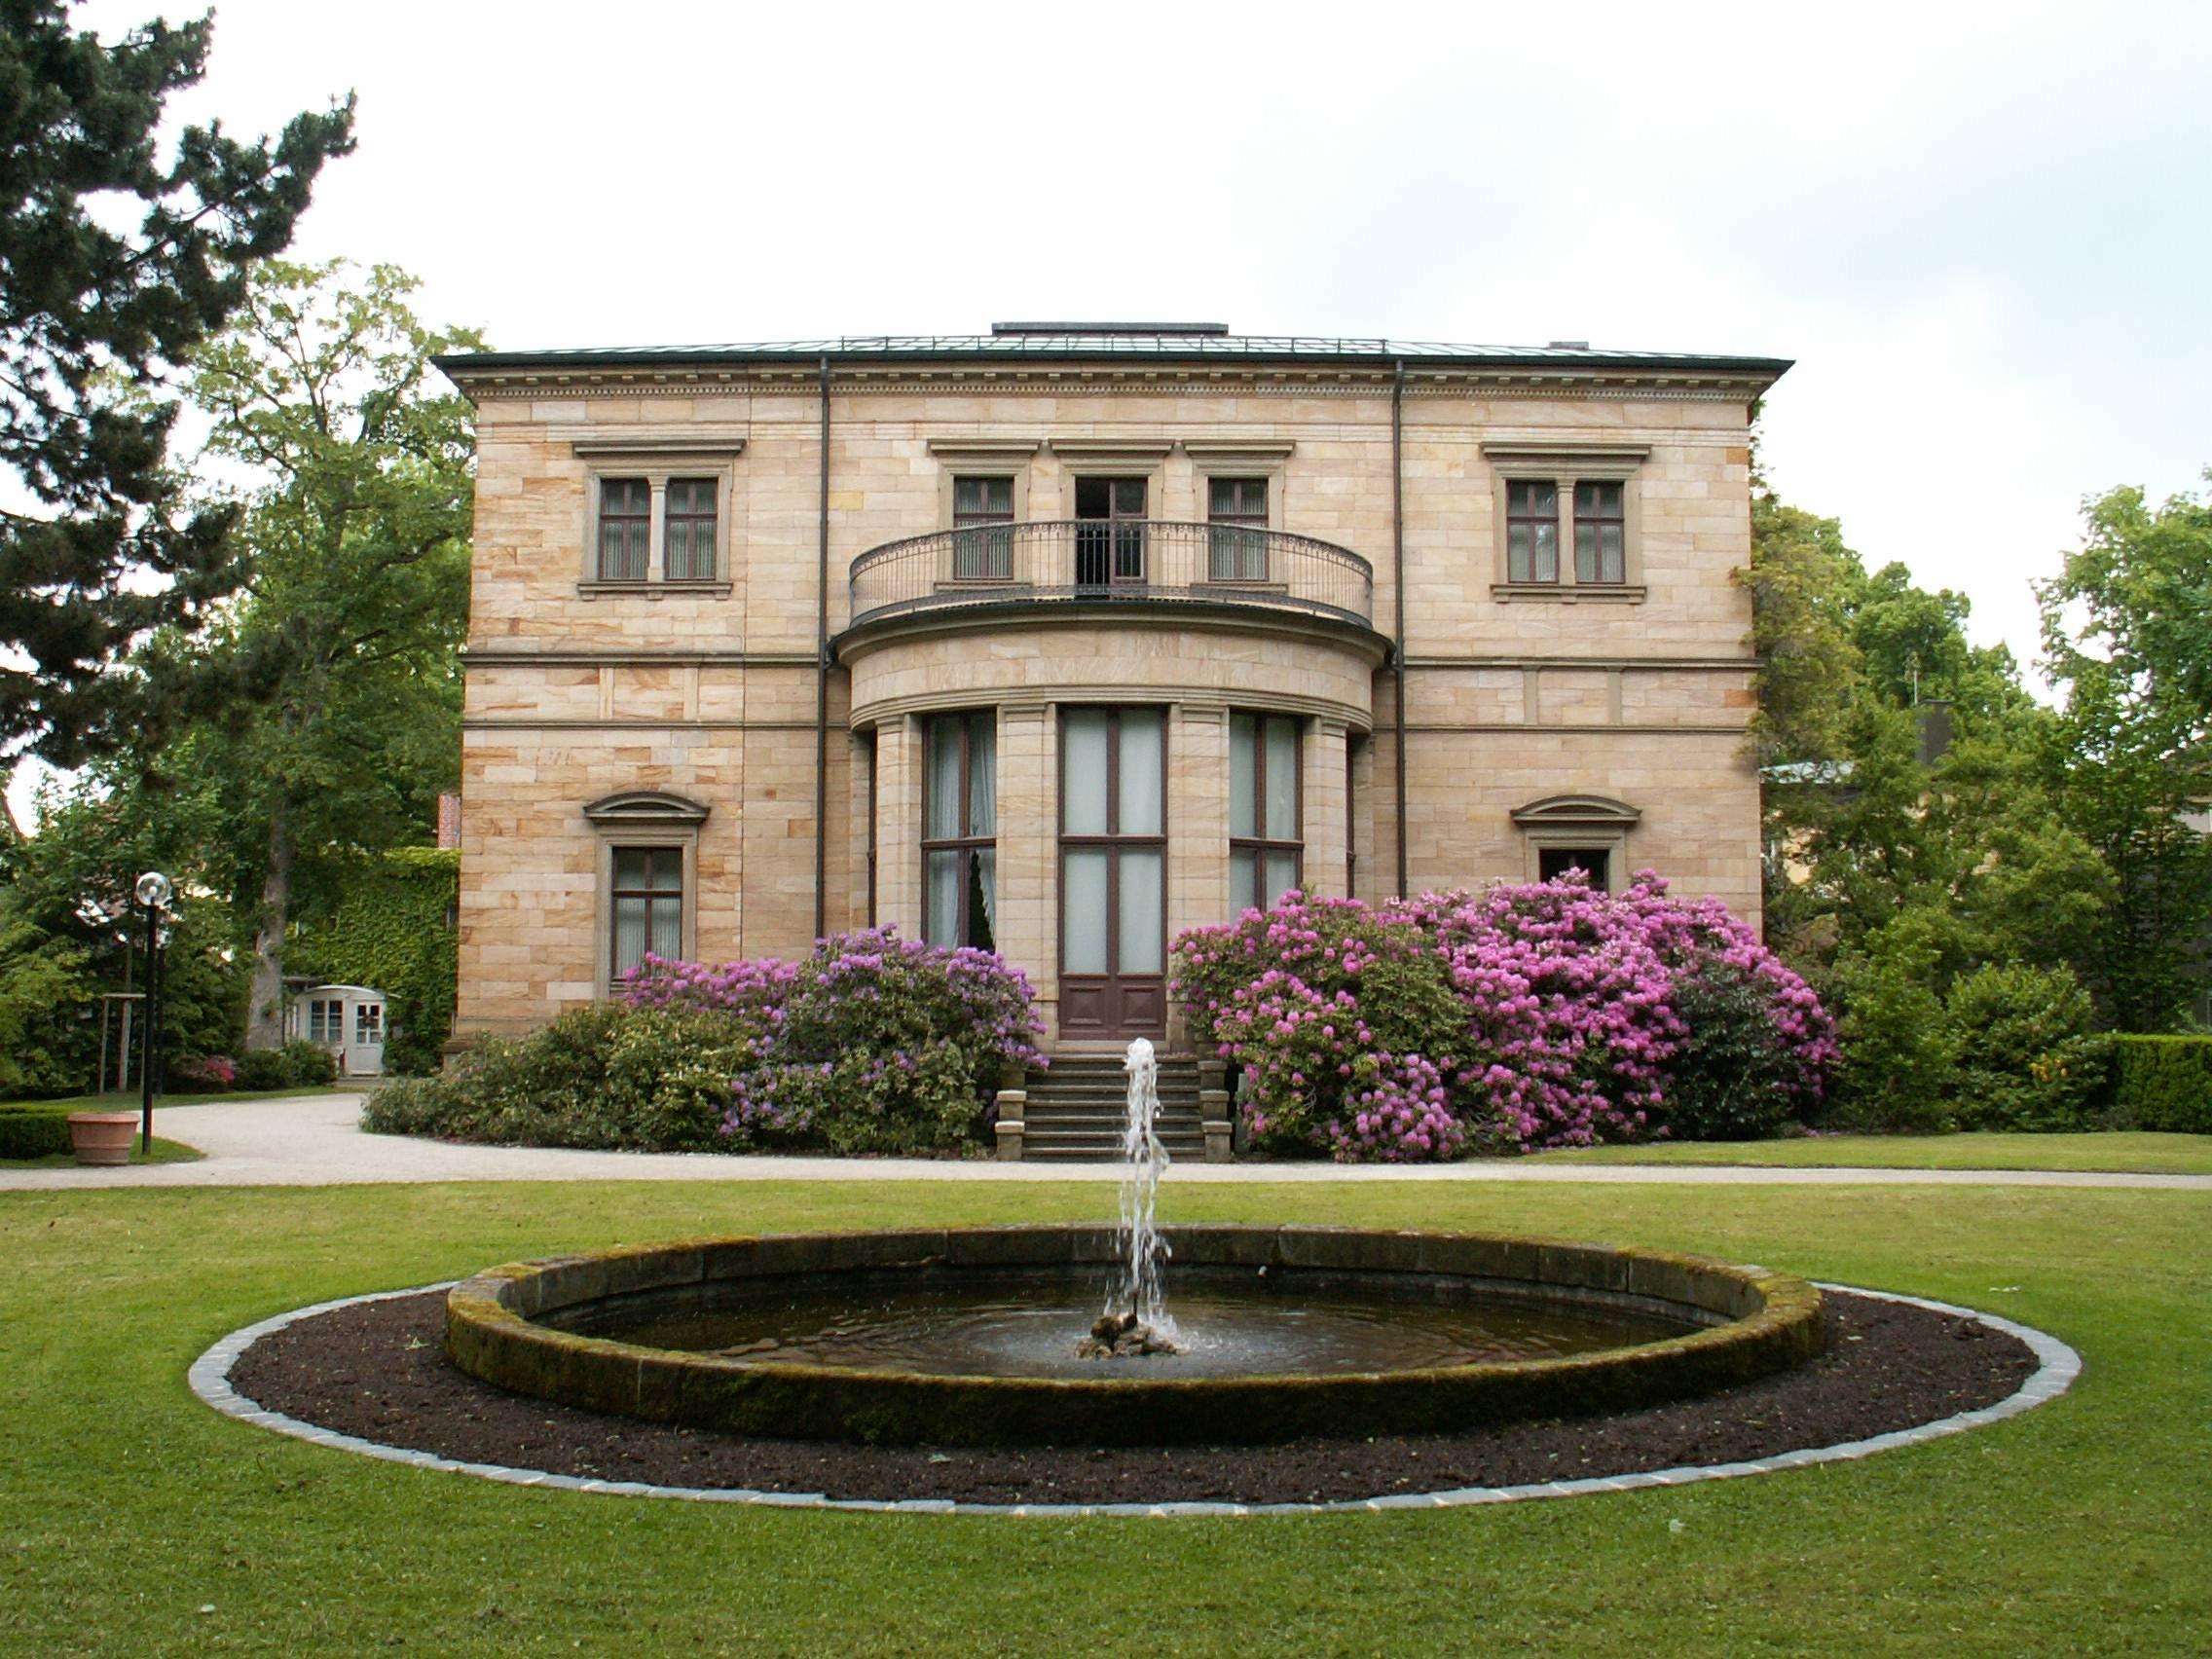 Wahnfried, Richard Wagners villa in Bayreuth Bayreuth